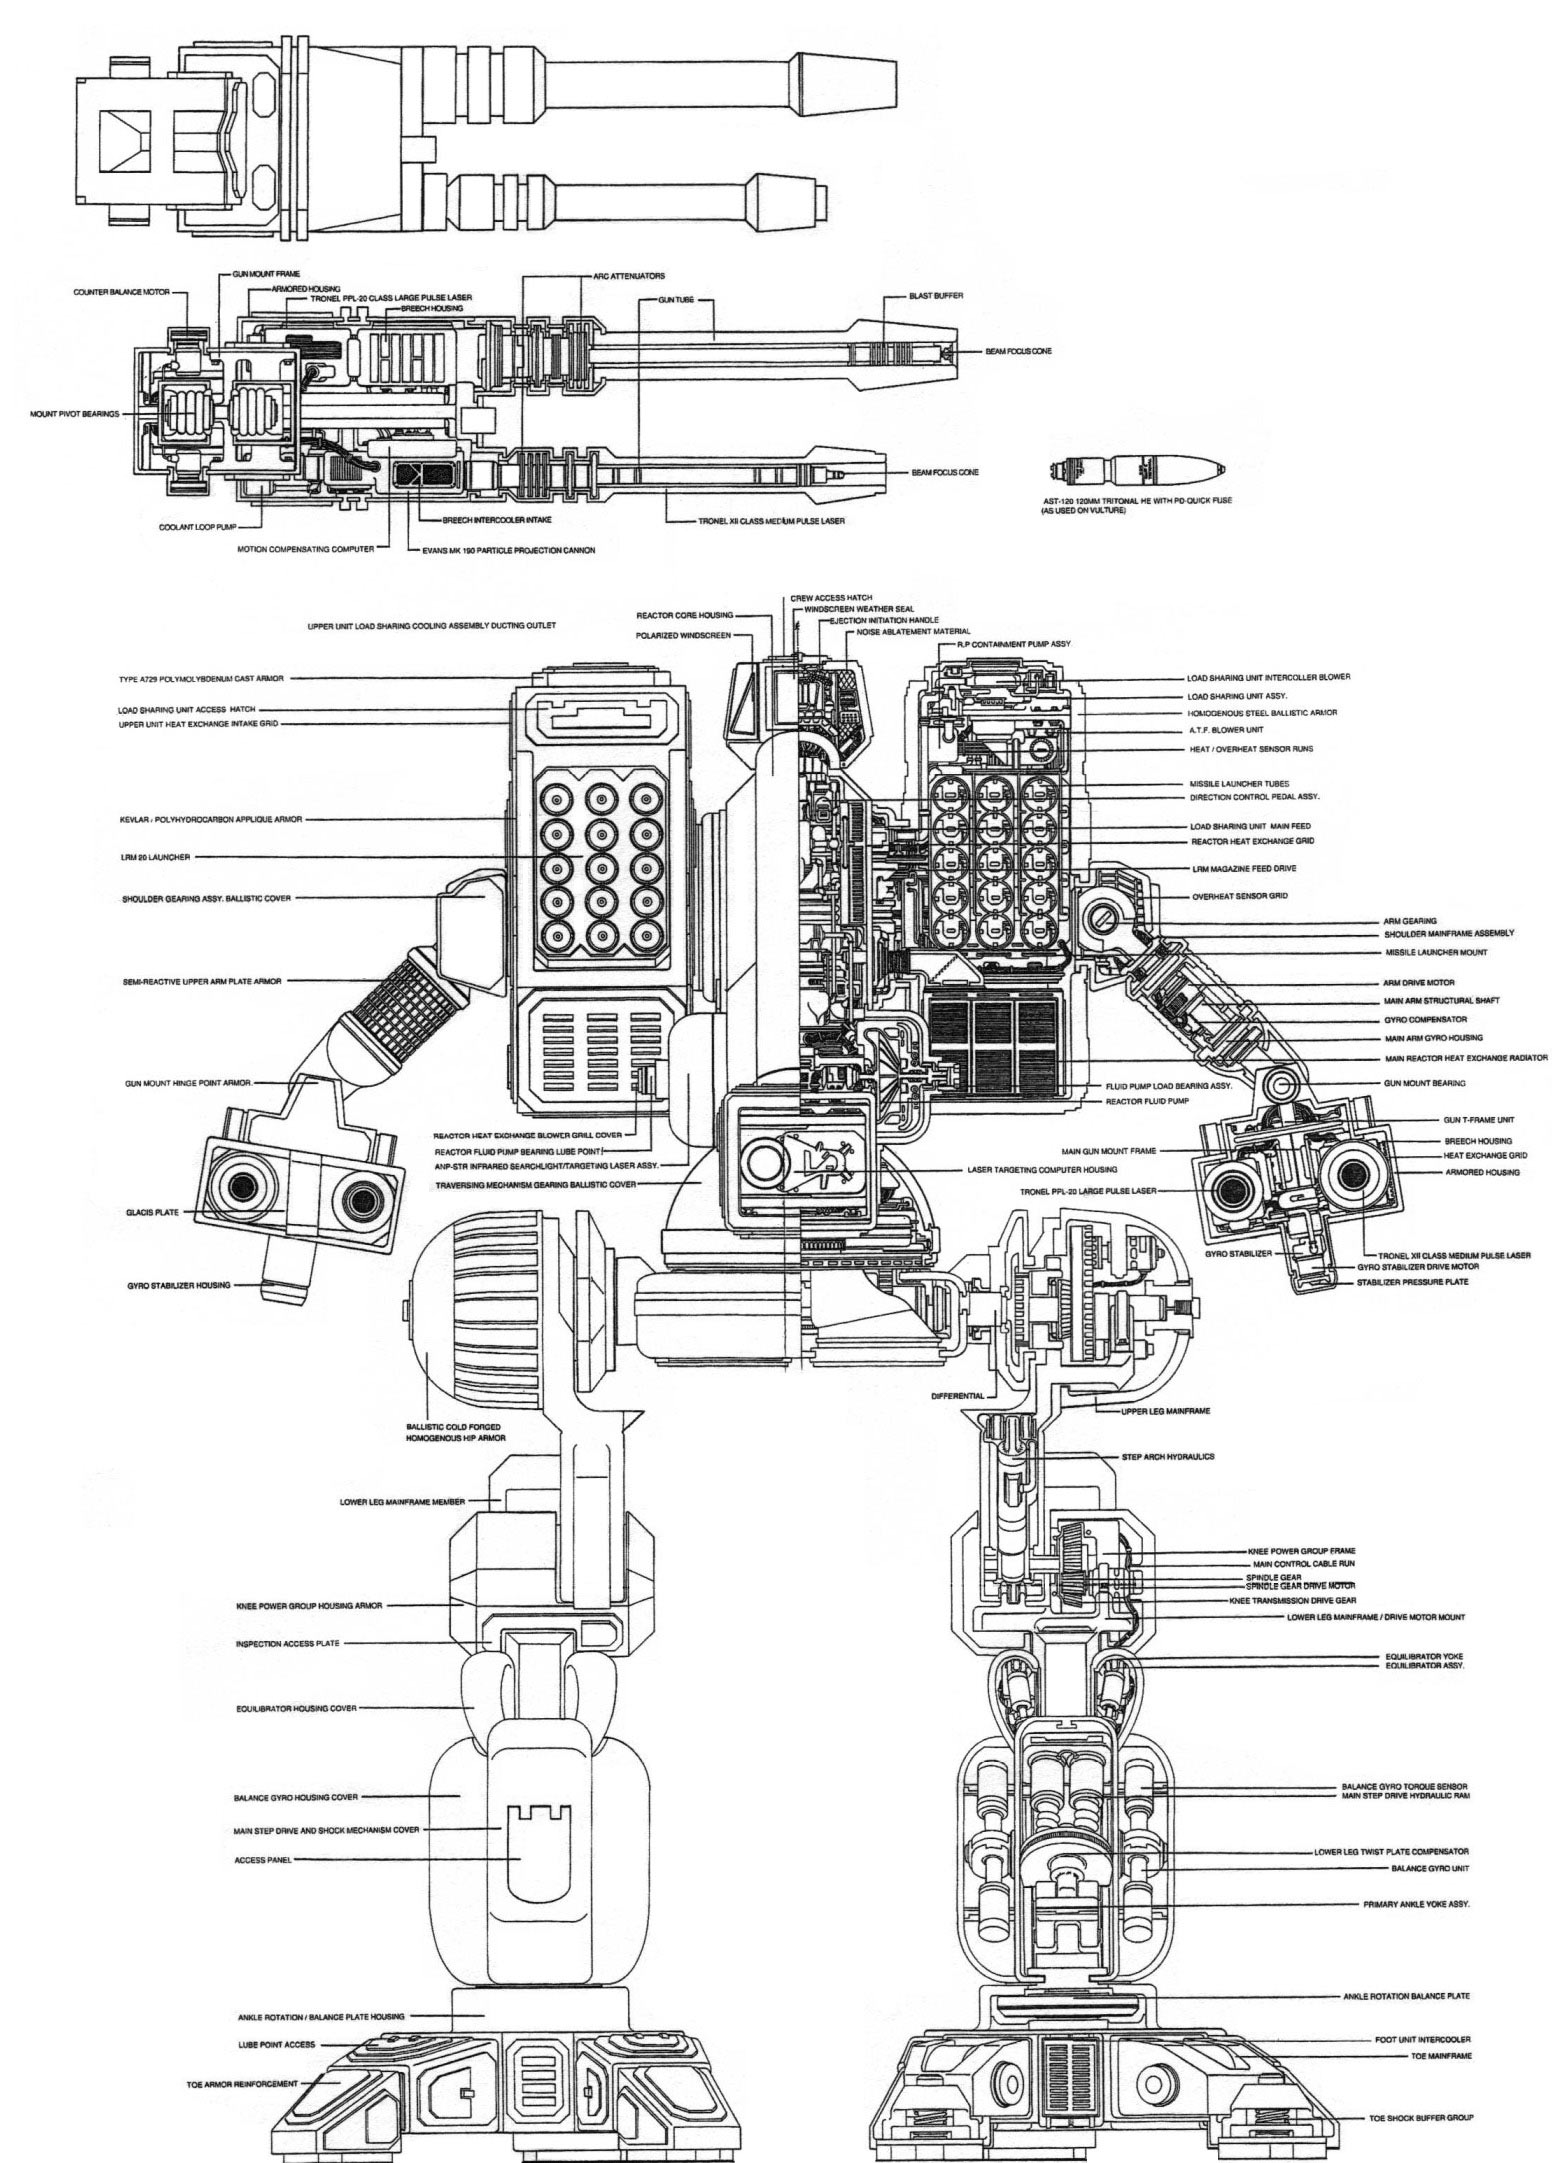 Mech Diagrams